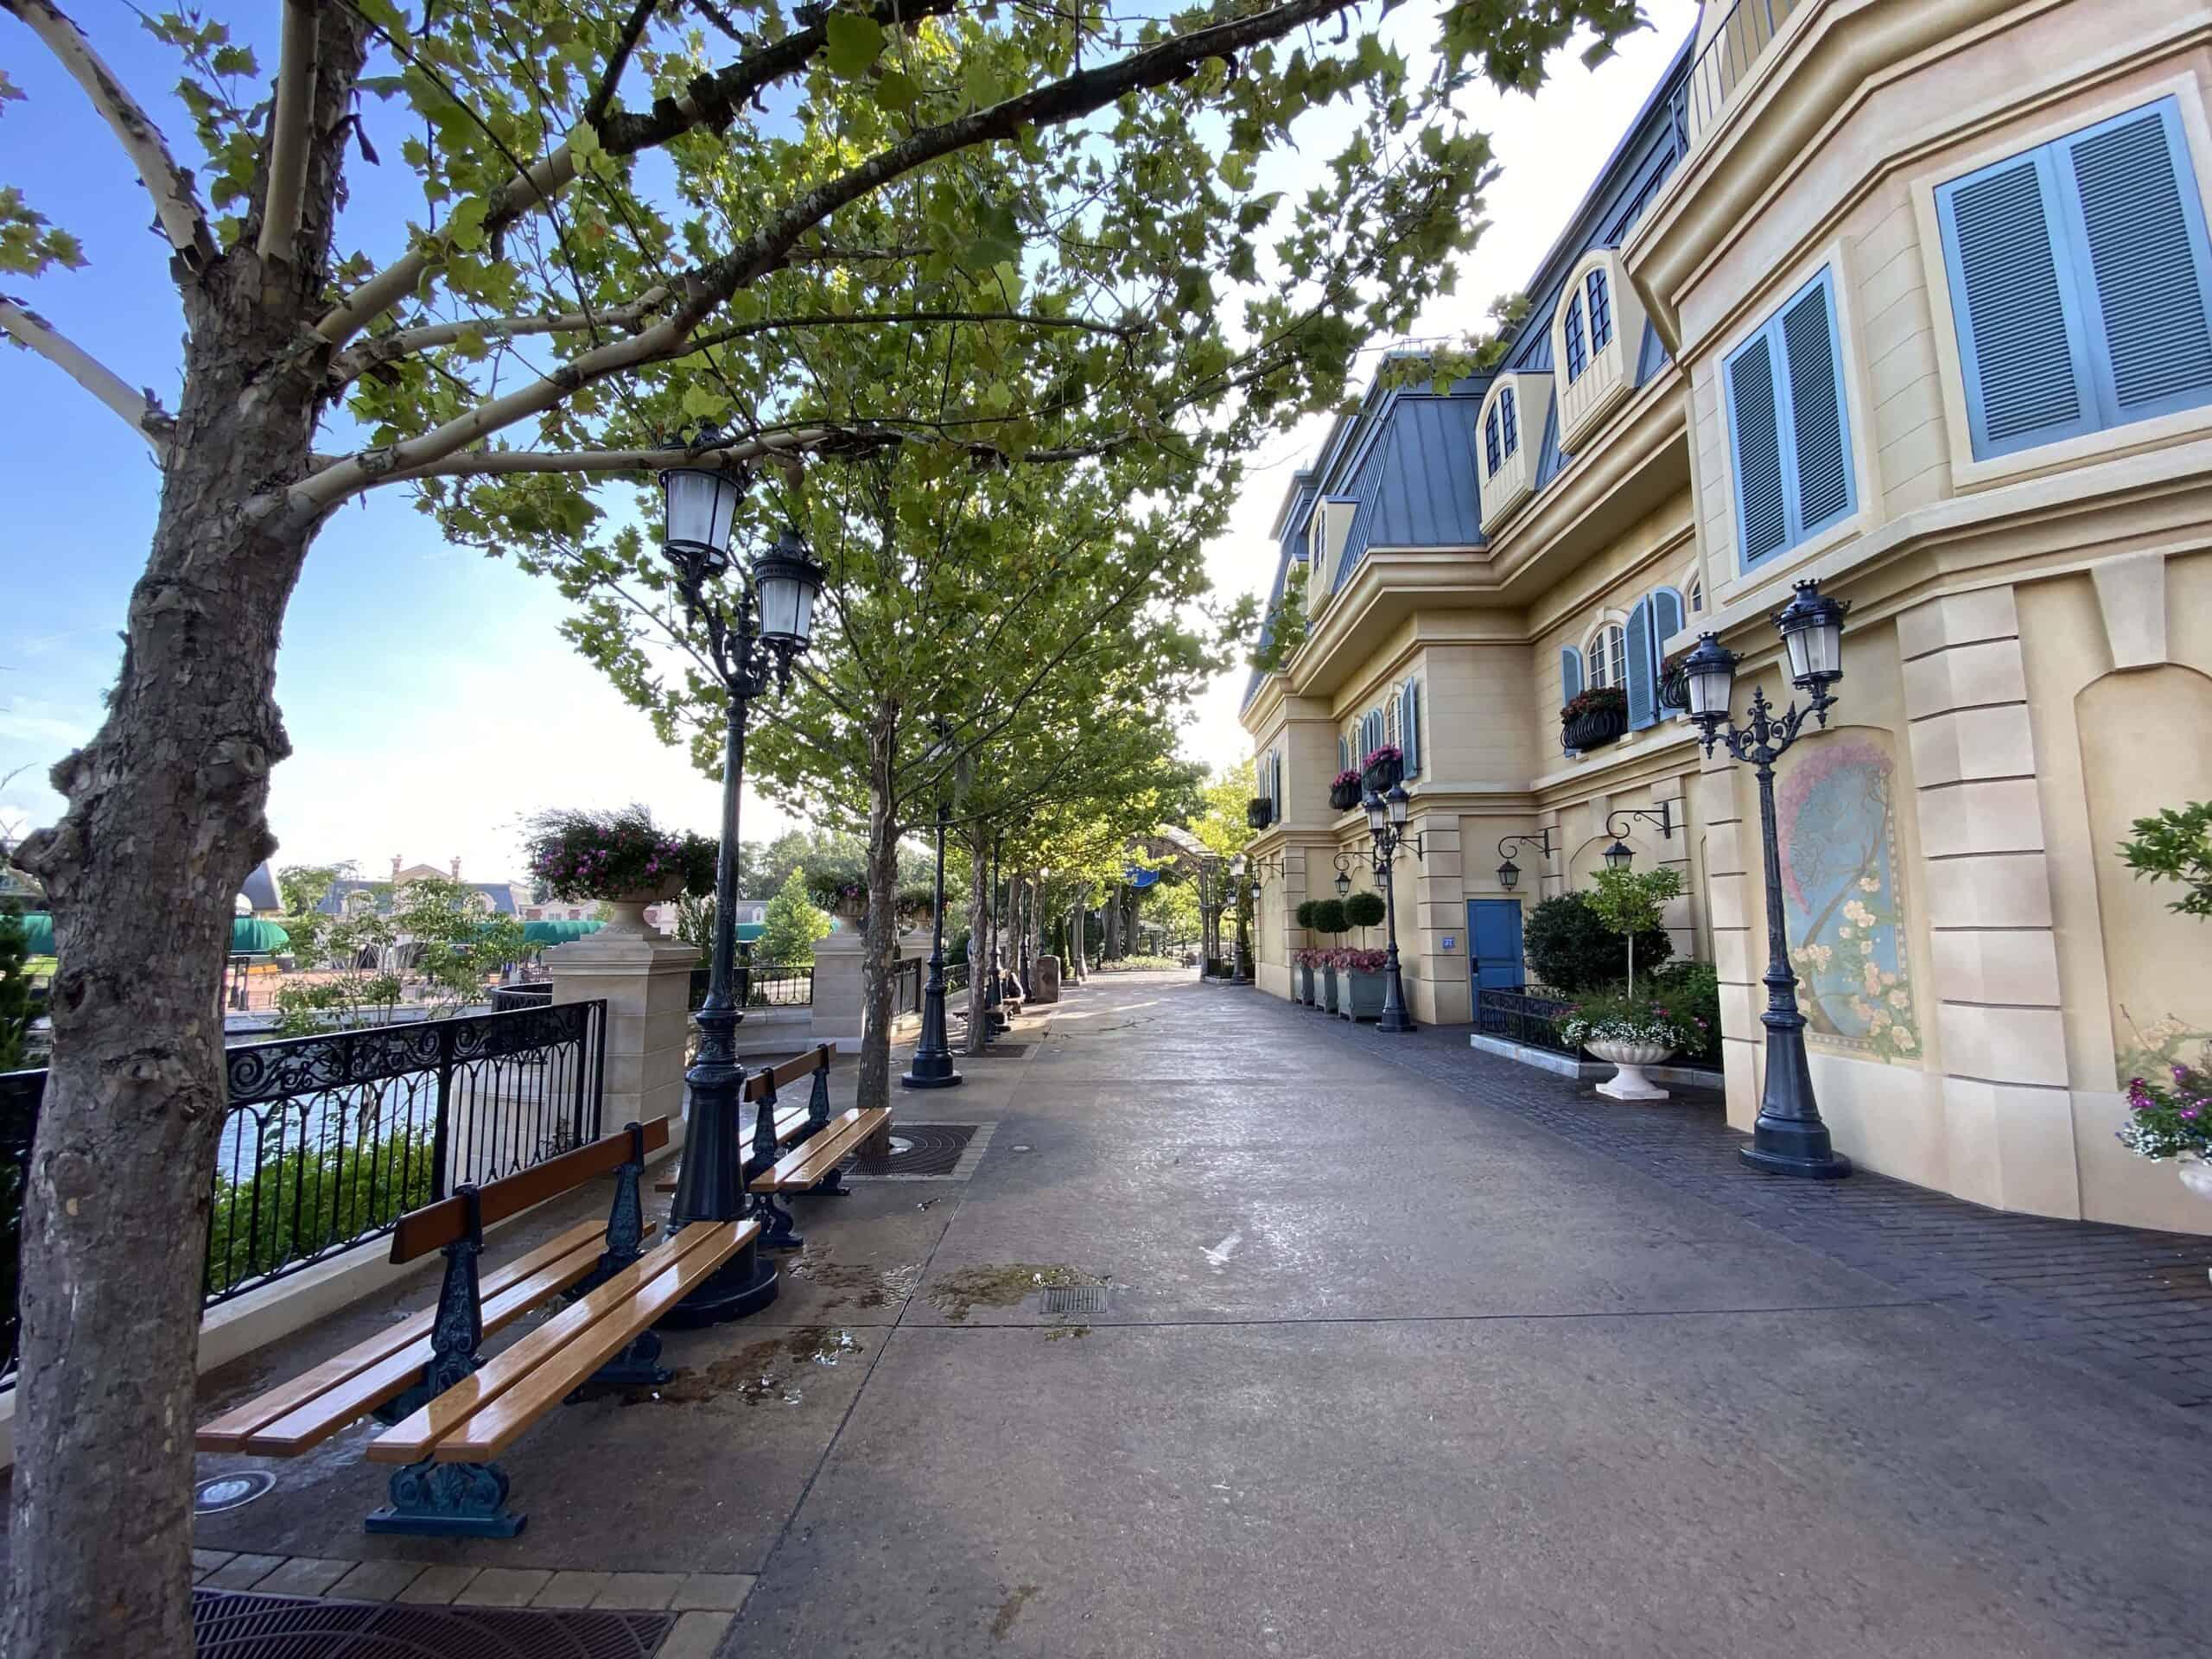 Ratatouille-France-Pavilion-Expansion-scaled